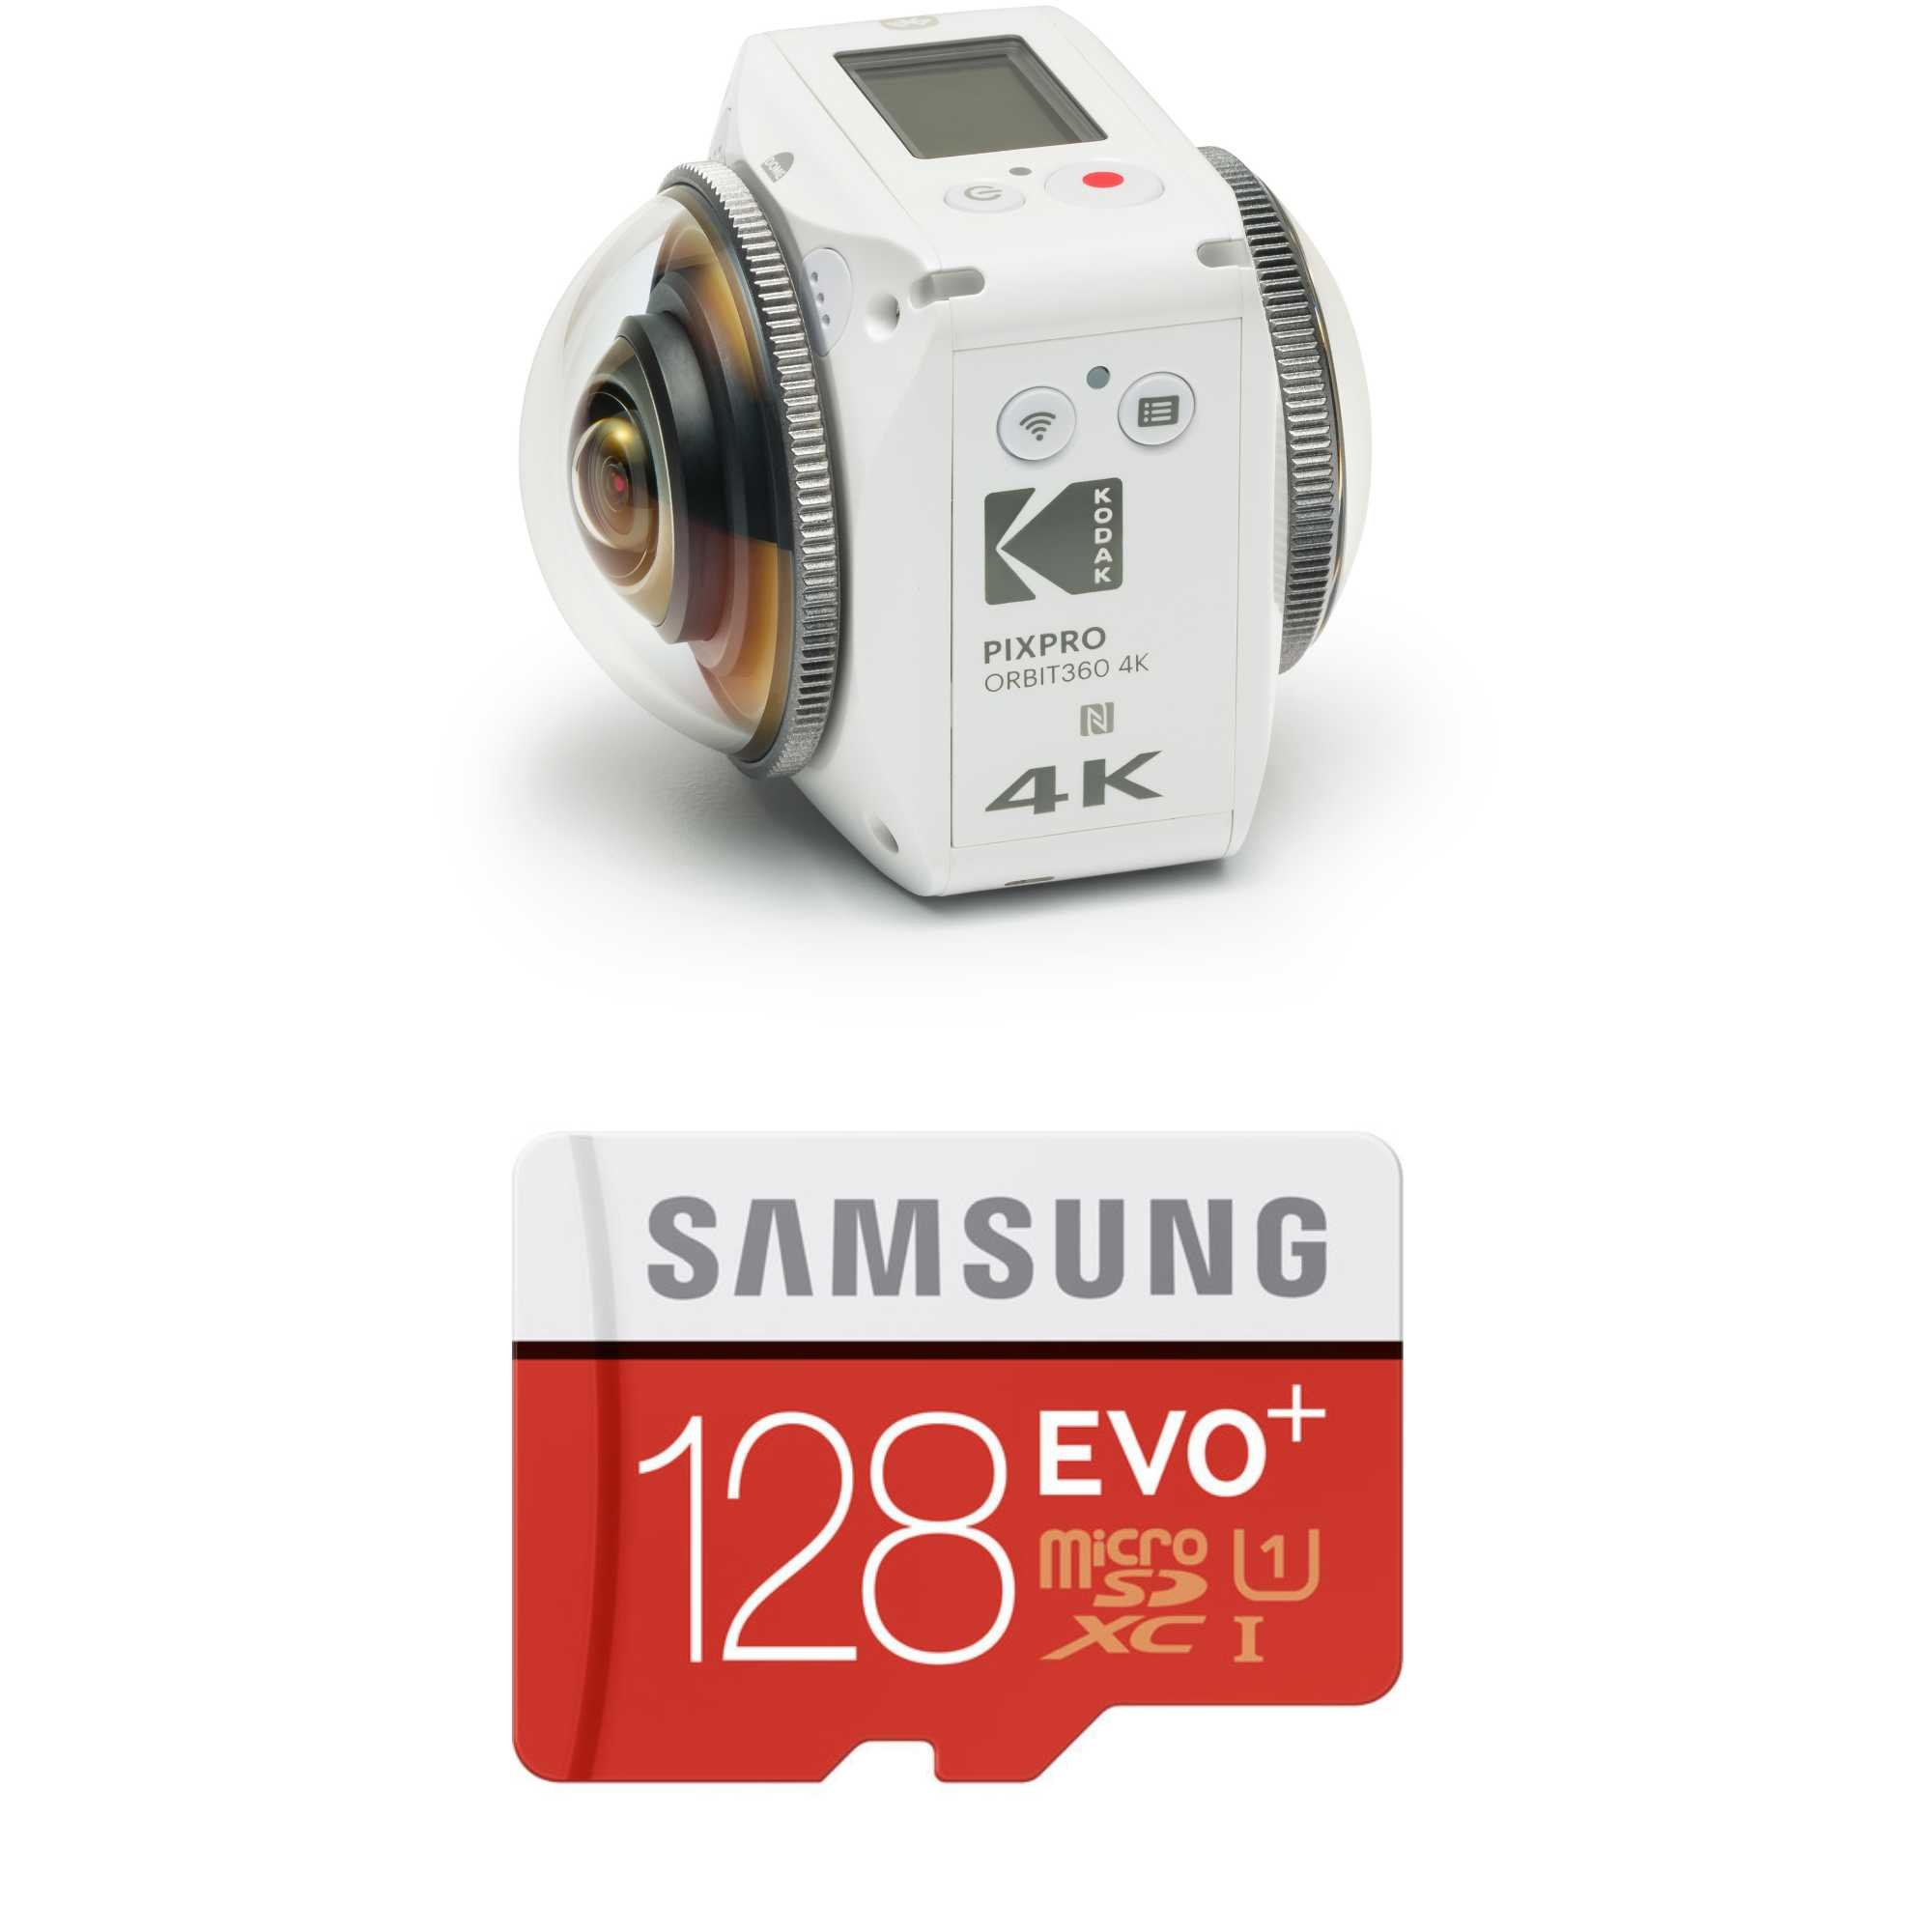 KODAK PIXPRO ORBIT360 4K 360° VR Camera Adventure Pack 128GB Bundle